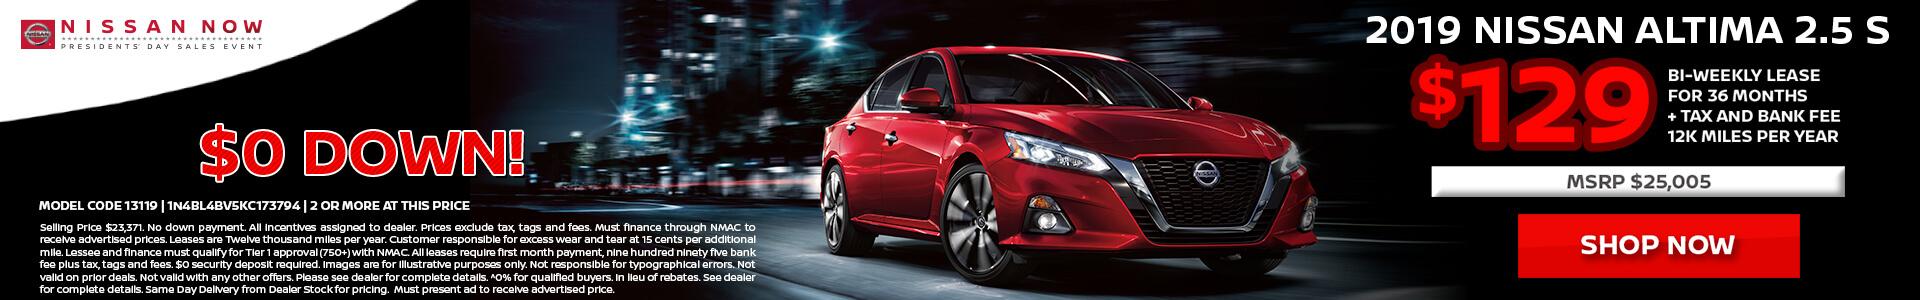 Nissan Altima $258 Lease